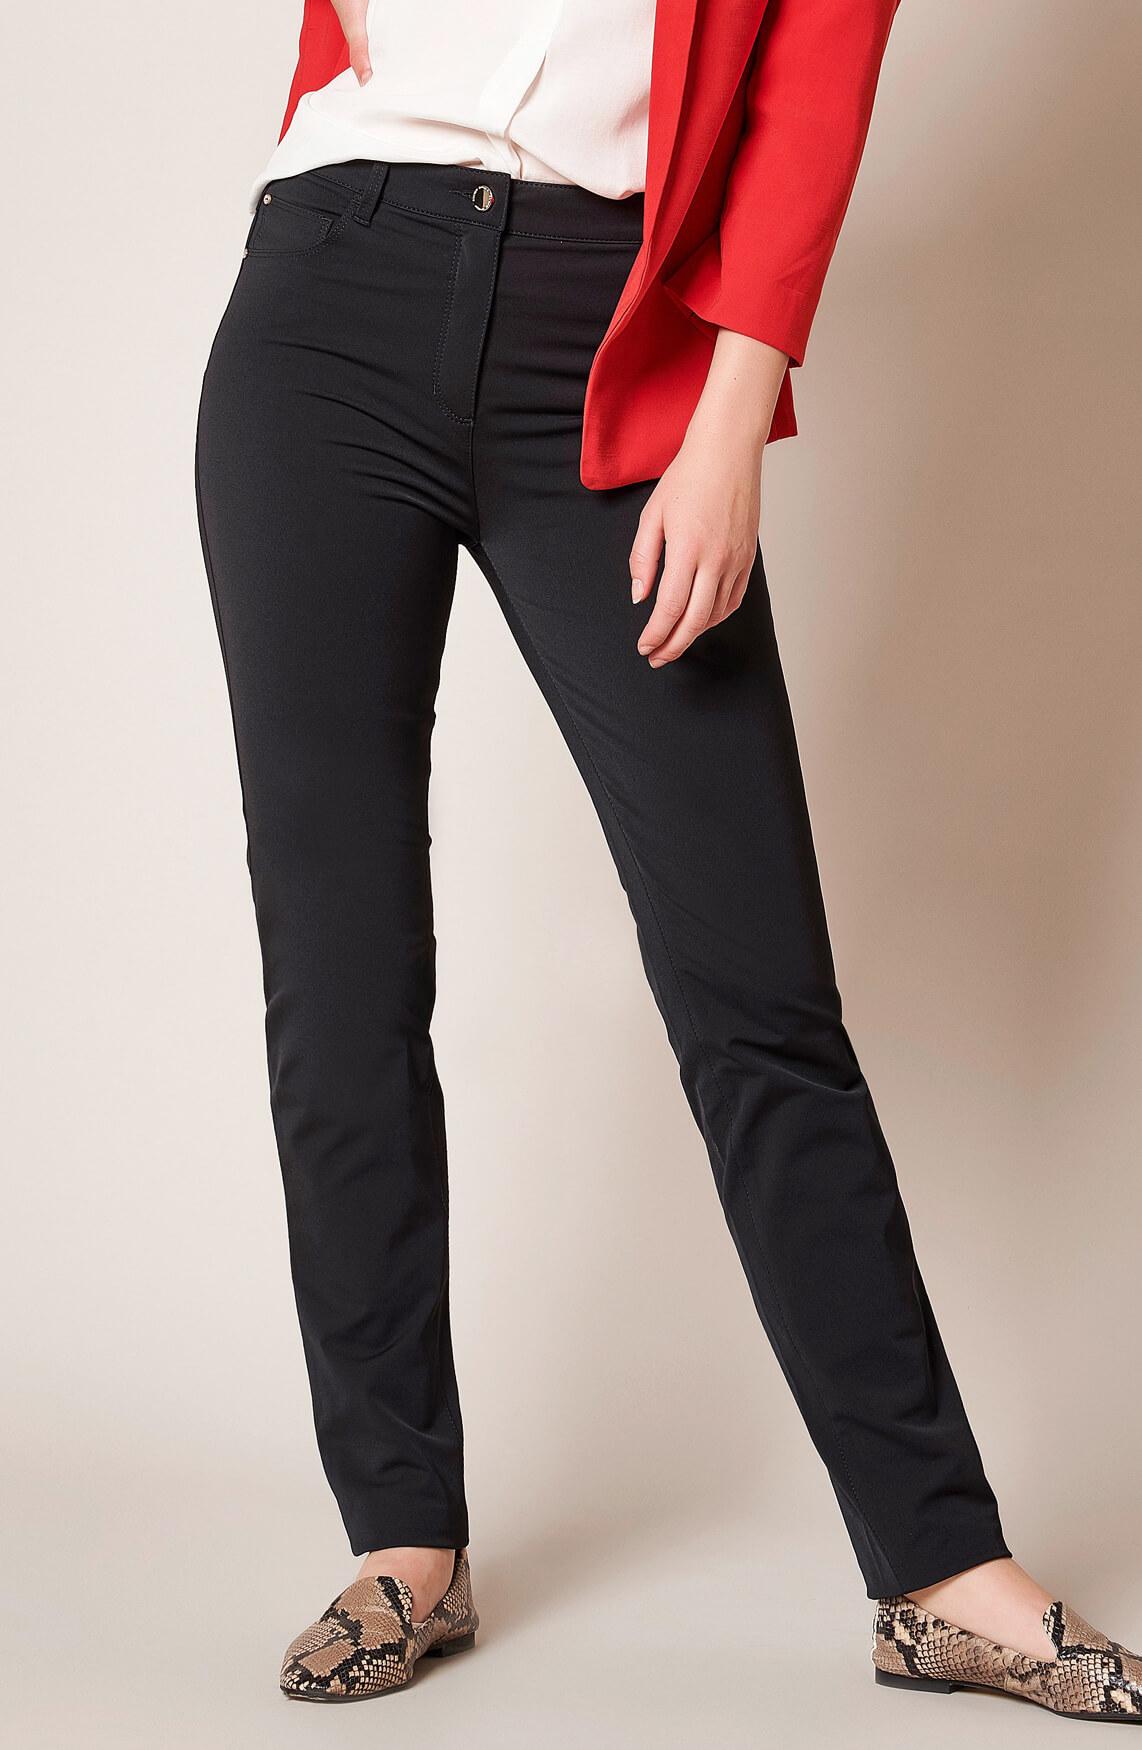 Rosner Dames L30 Audrey pantalon Zwart